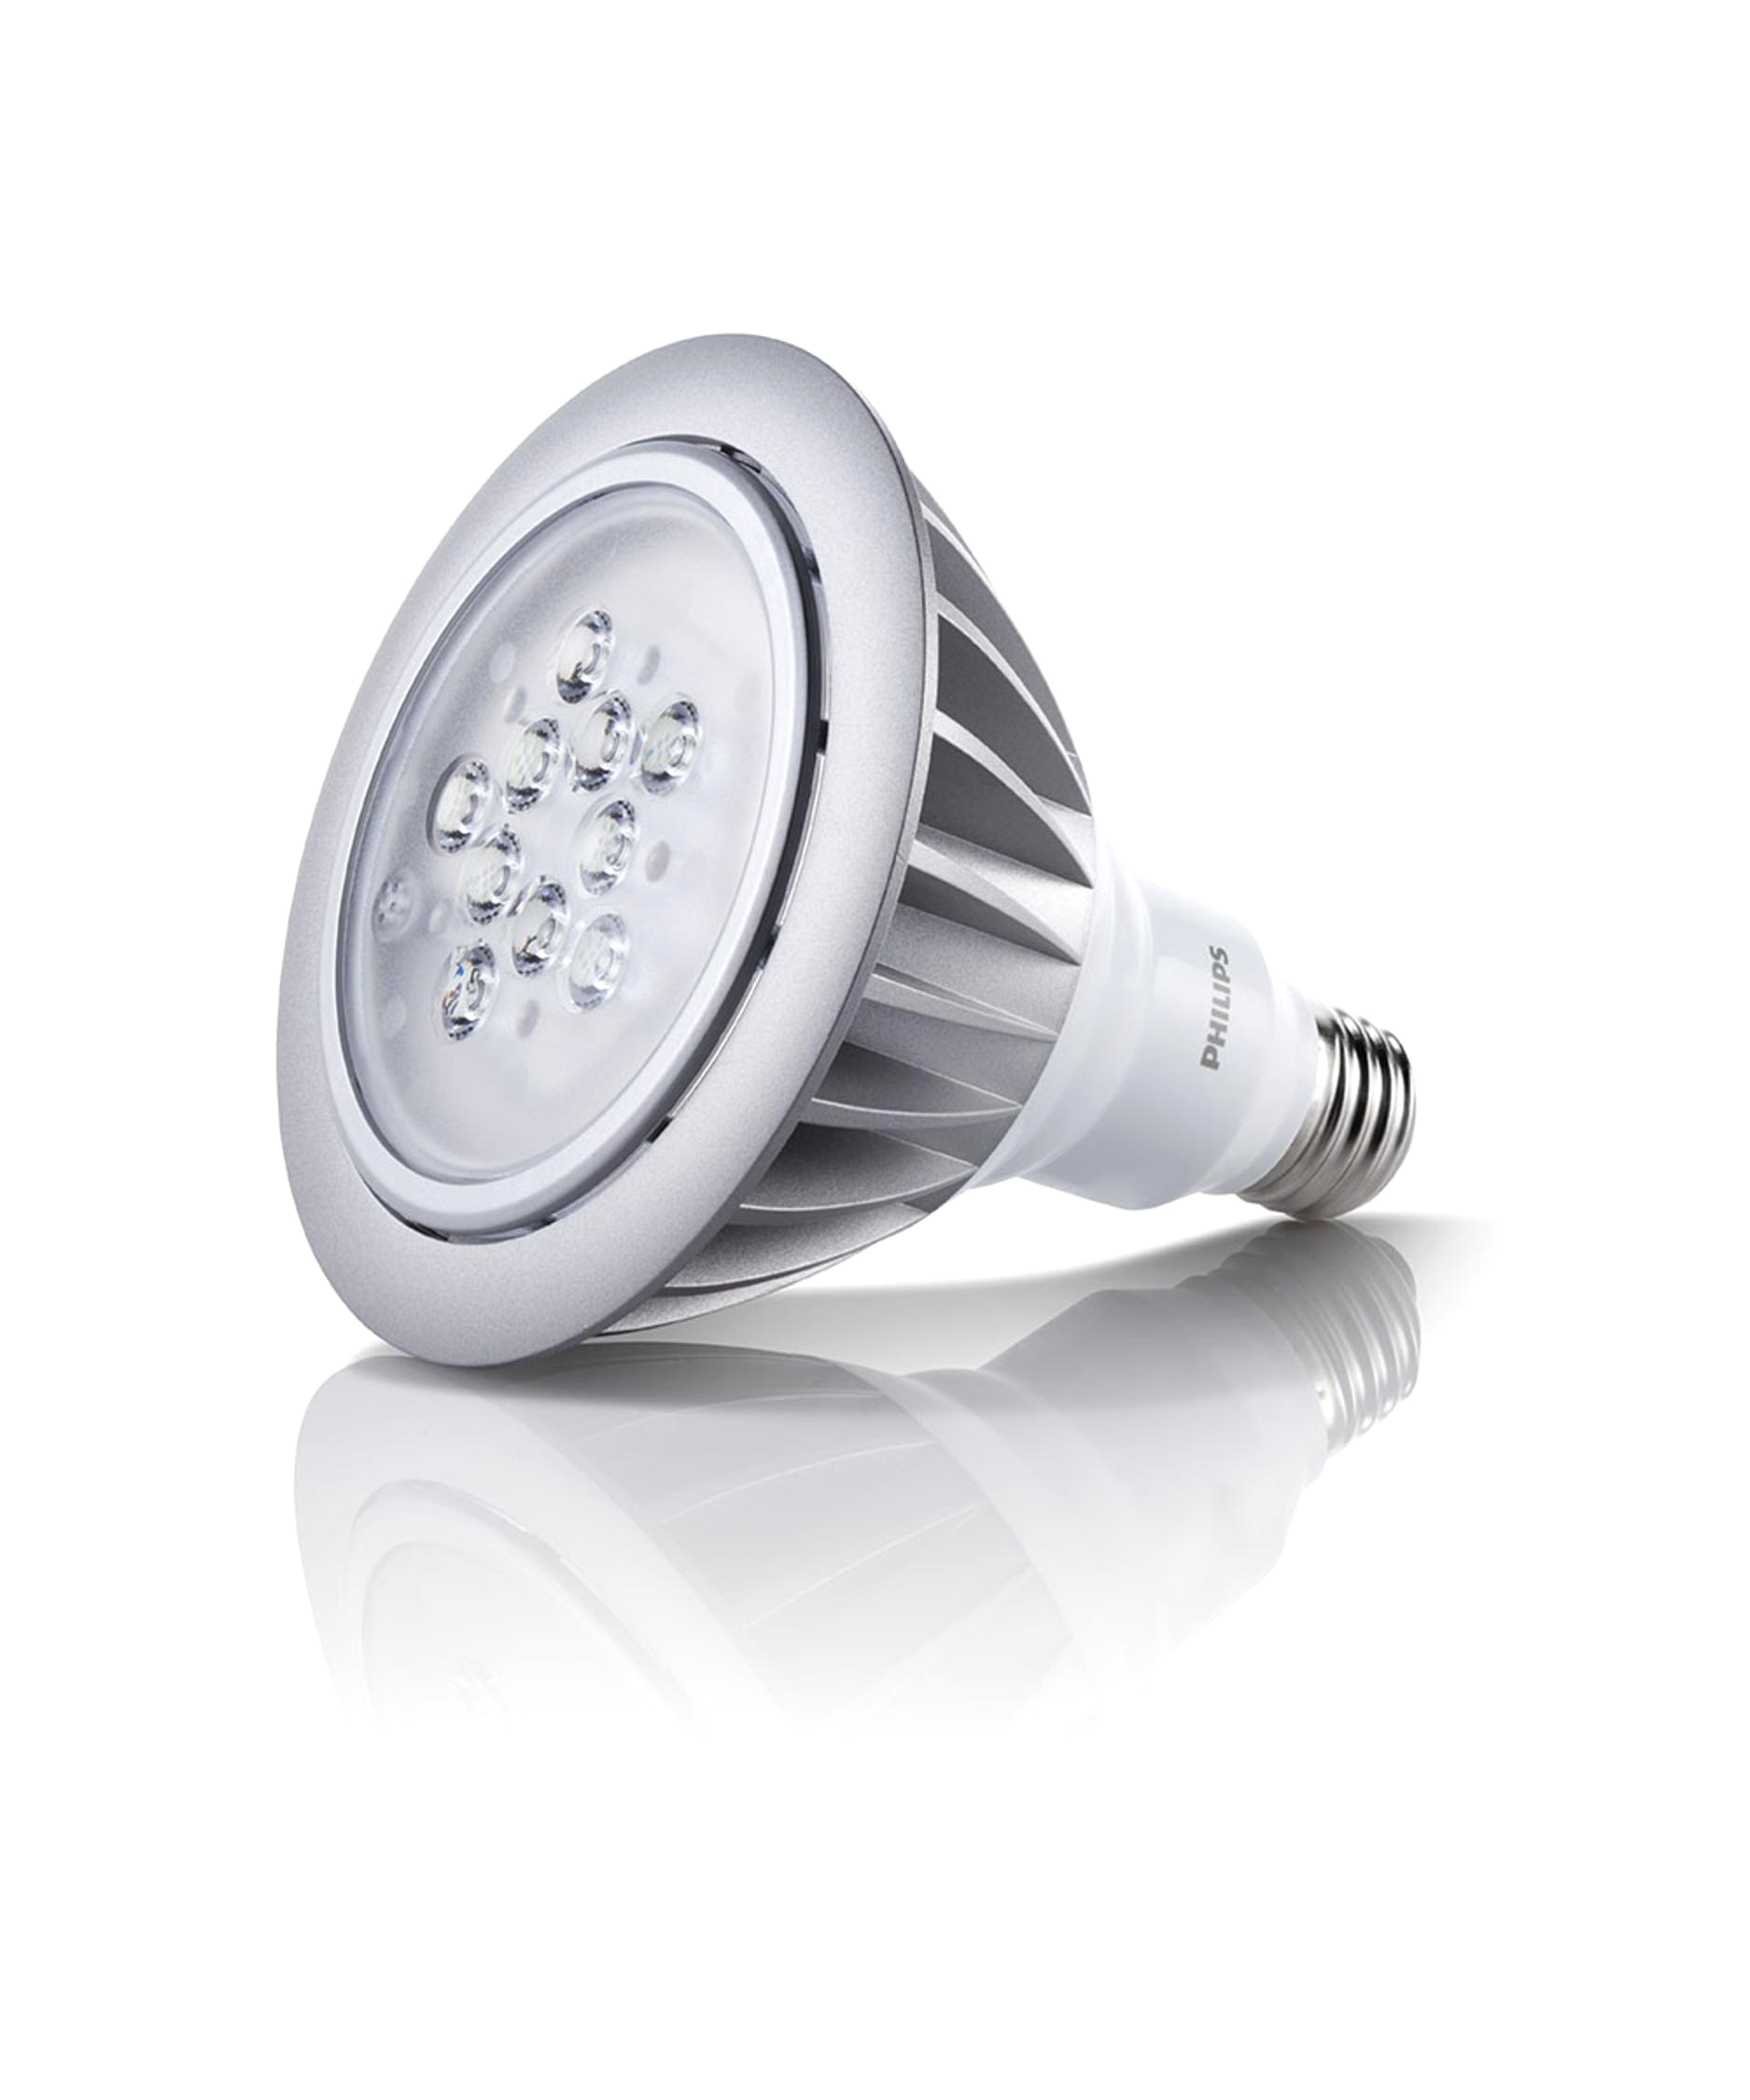 150 watt halogen bulb awesome lighting philips par38 led light bulb capitol par38 od led